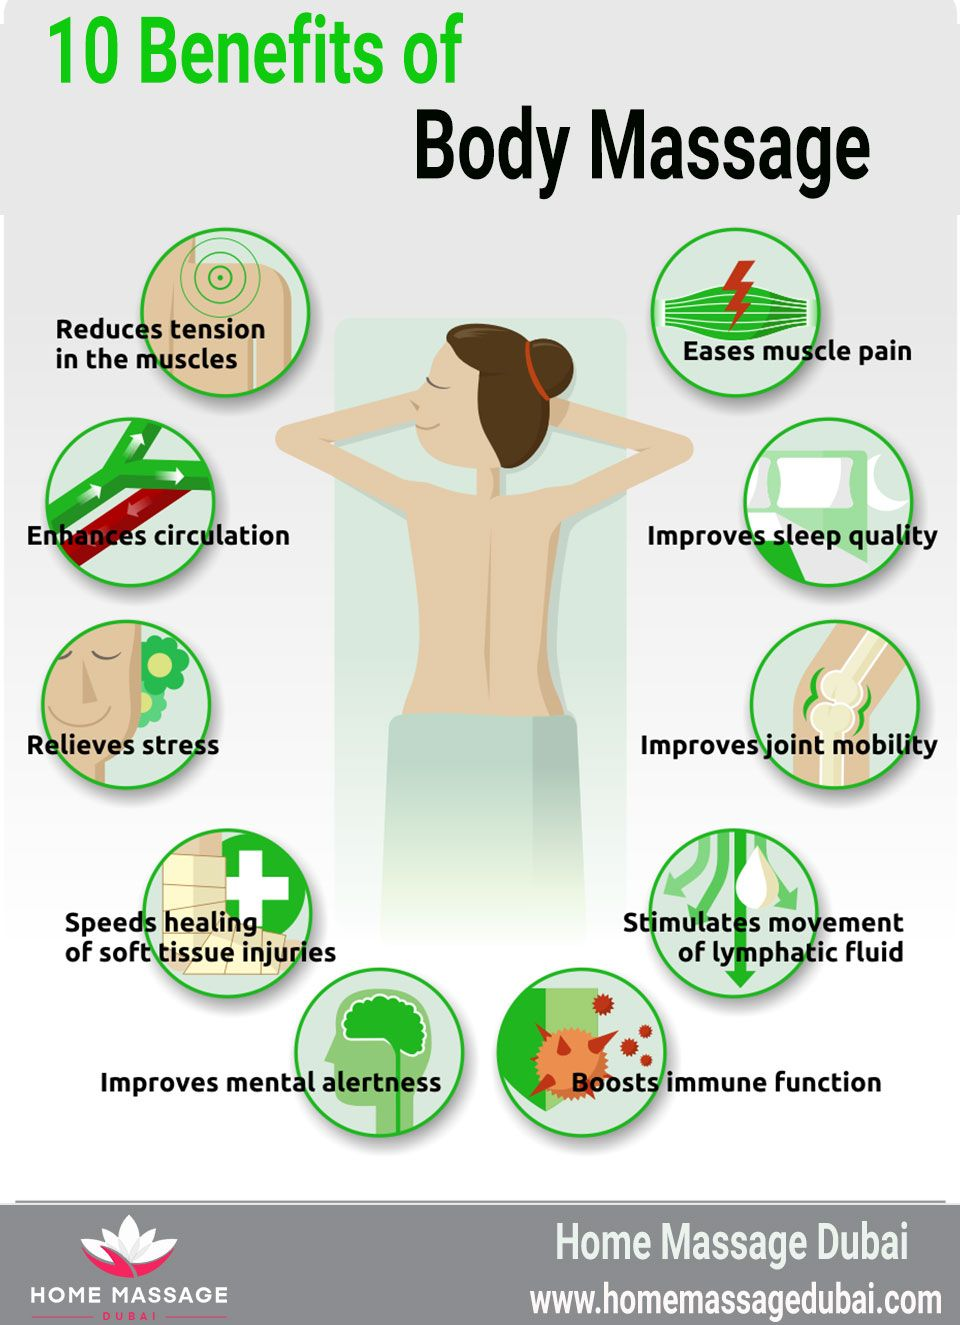 10 Benefits of body massage in Dubai. Massage therapy